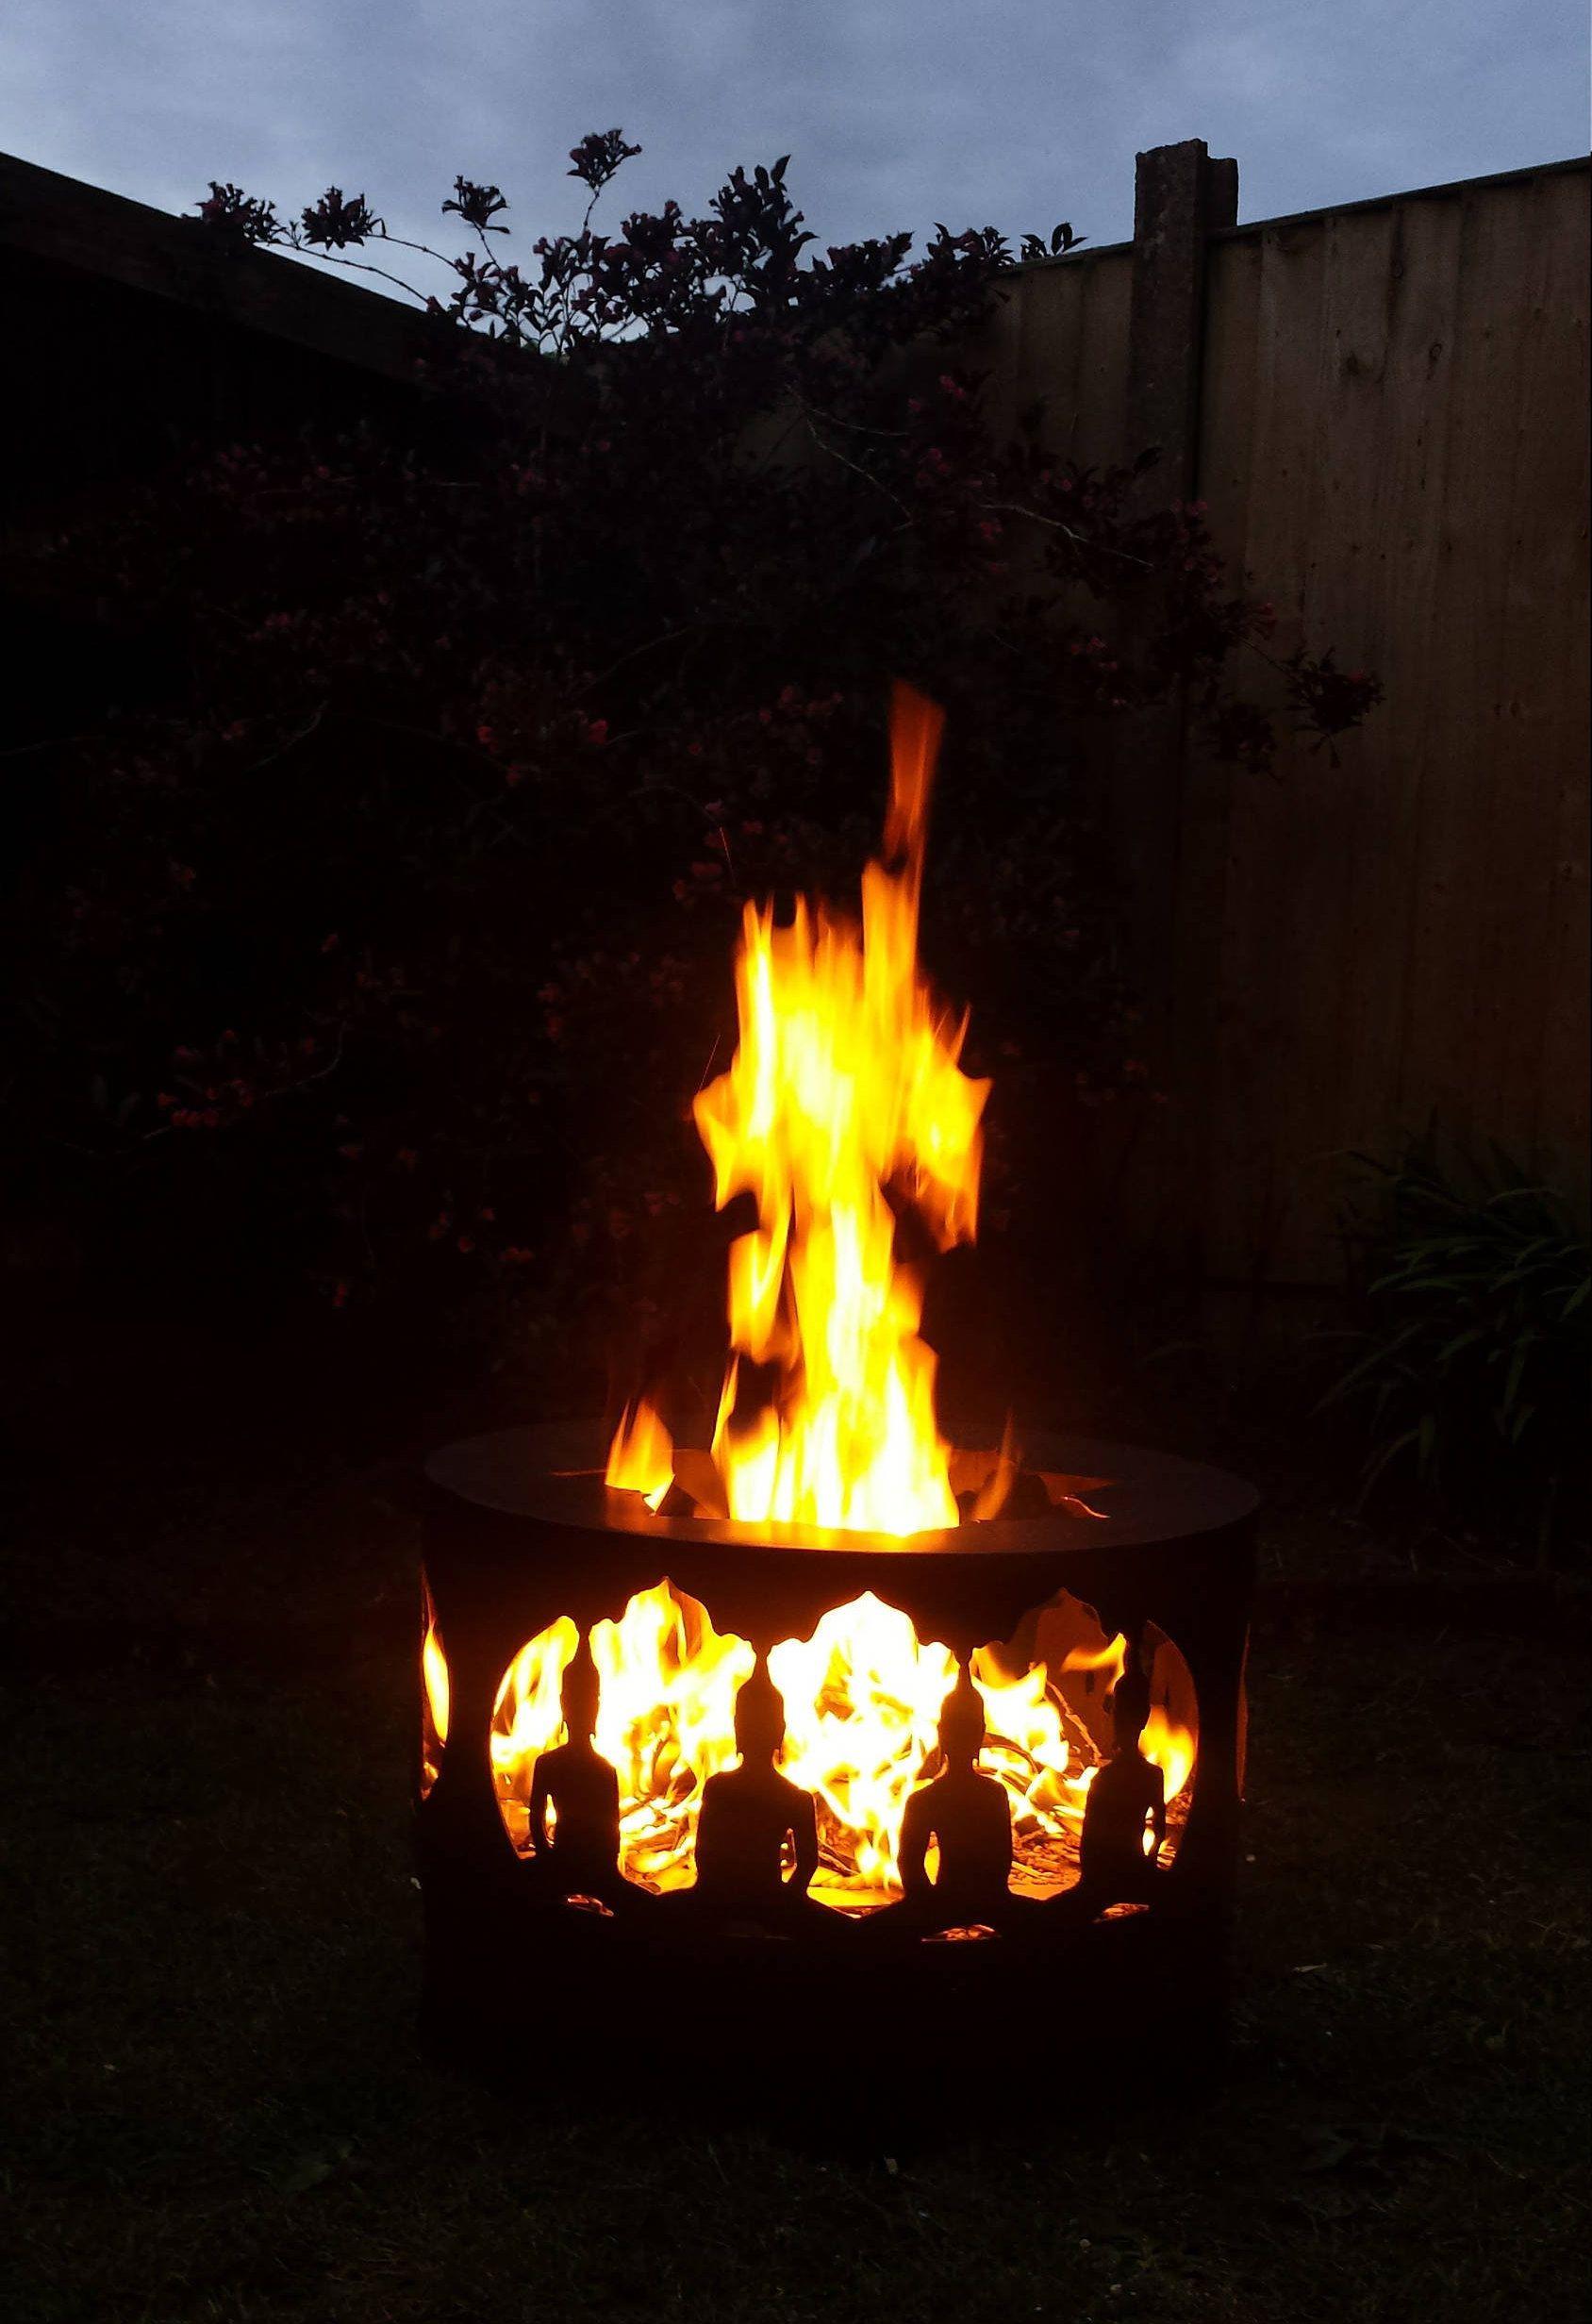 Bespoke Buddah Lotus Flower Fire Pit Chiminea Custom Made Fire